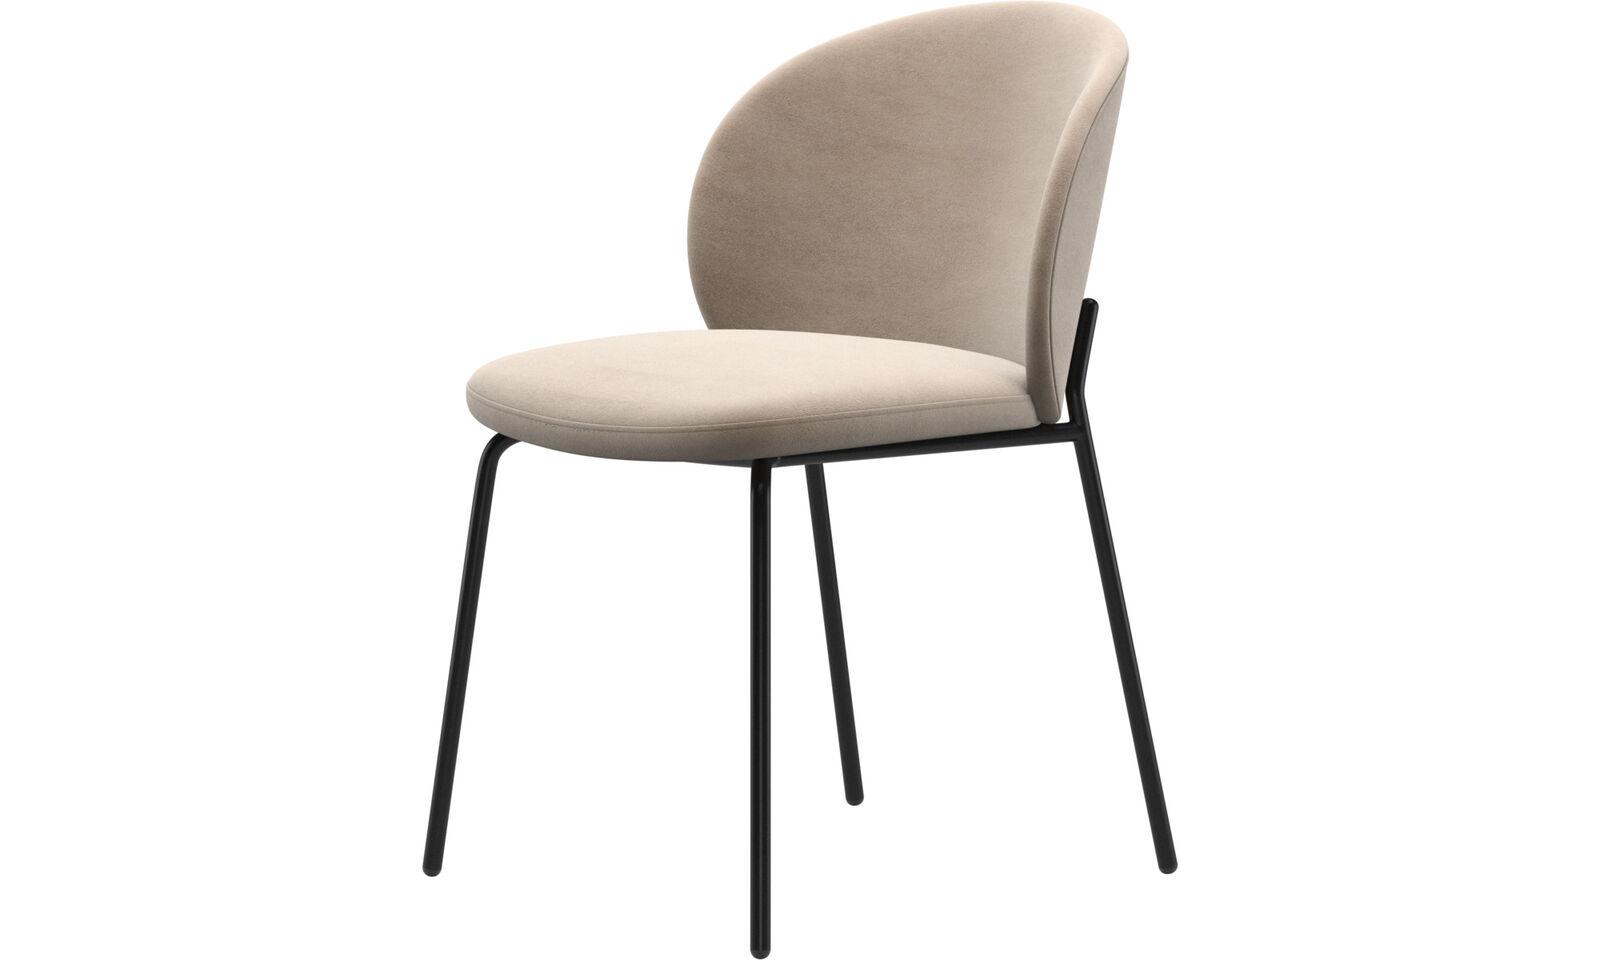 Set of 4 Princeton chairs